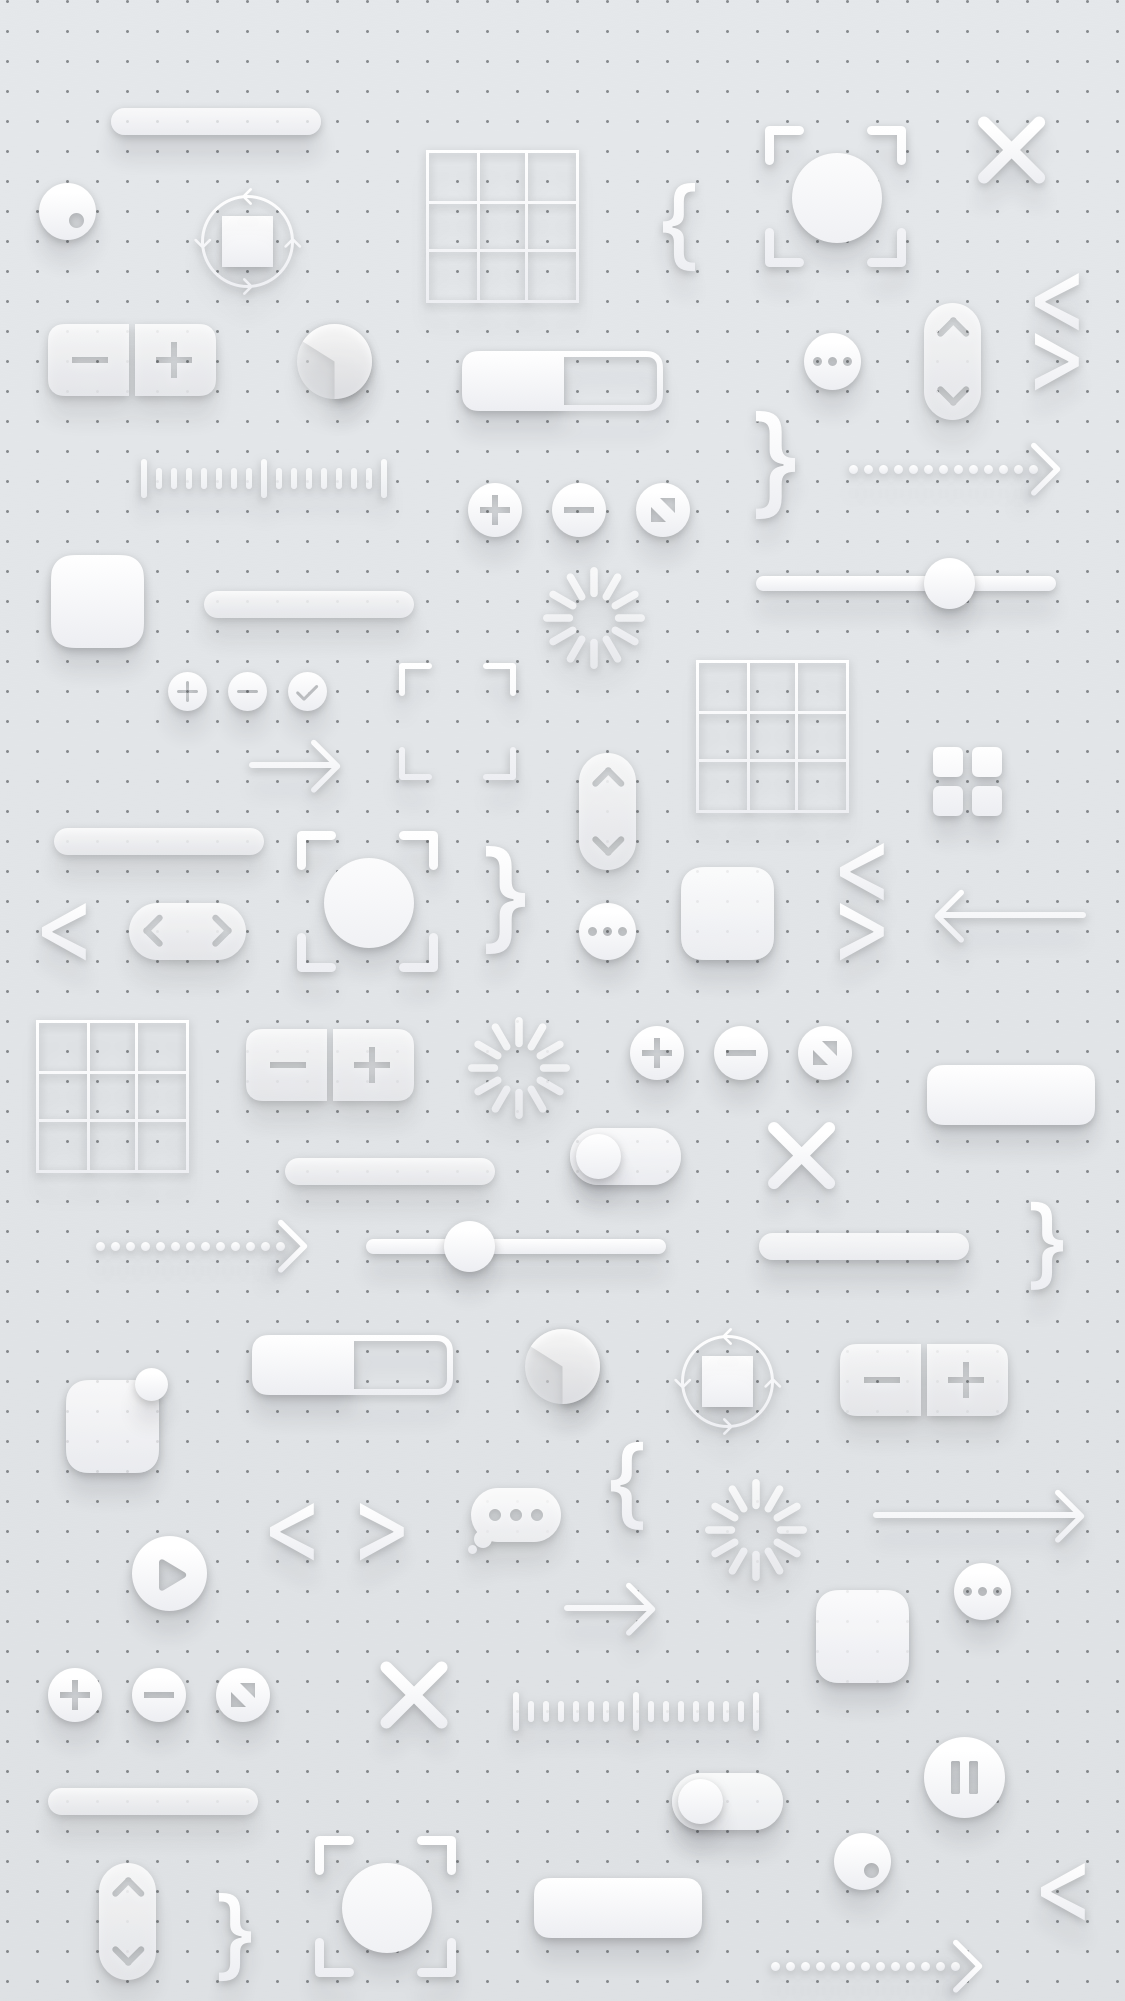 WWDC 2018 wallpaper iPhone 8 no logo